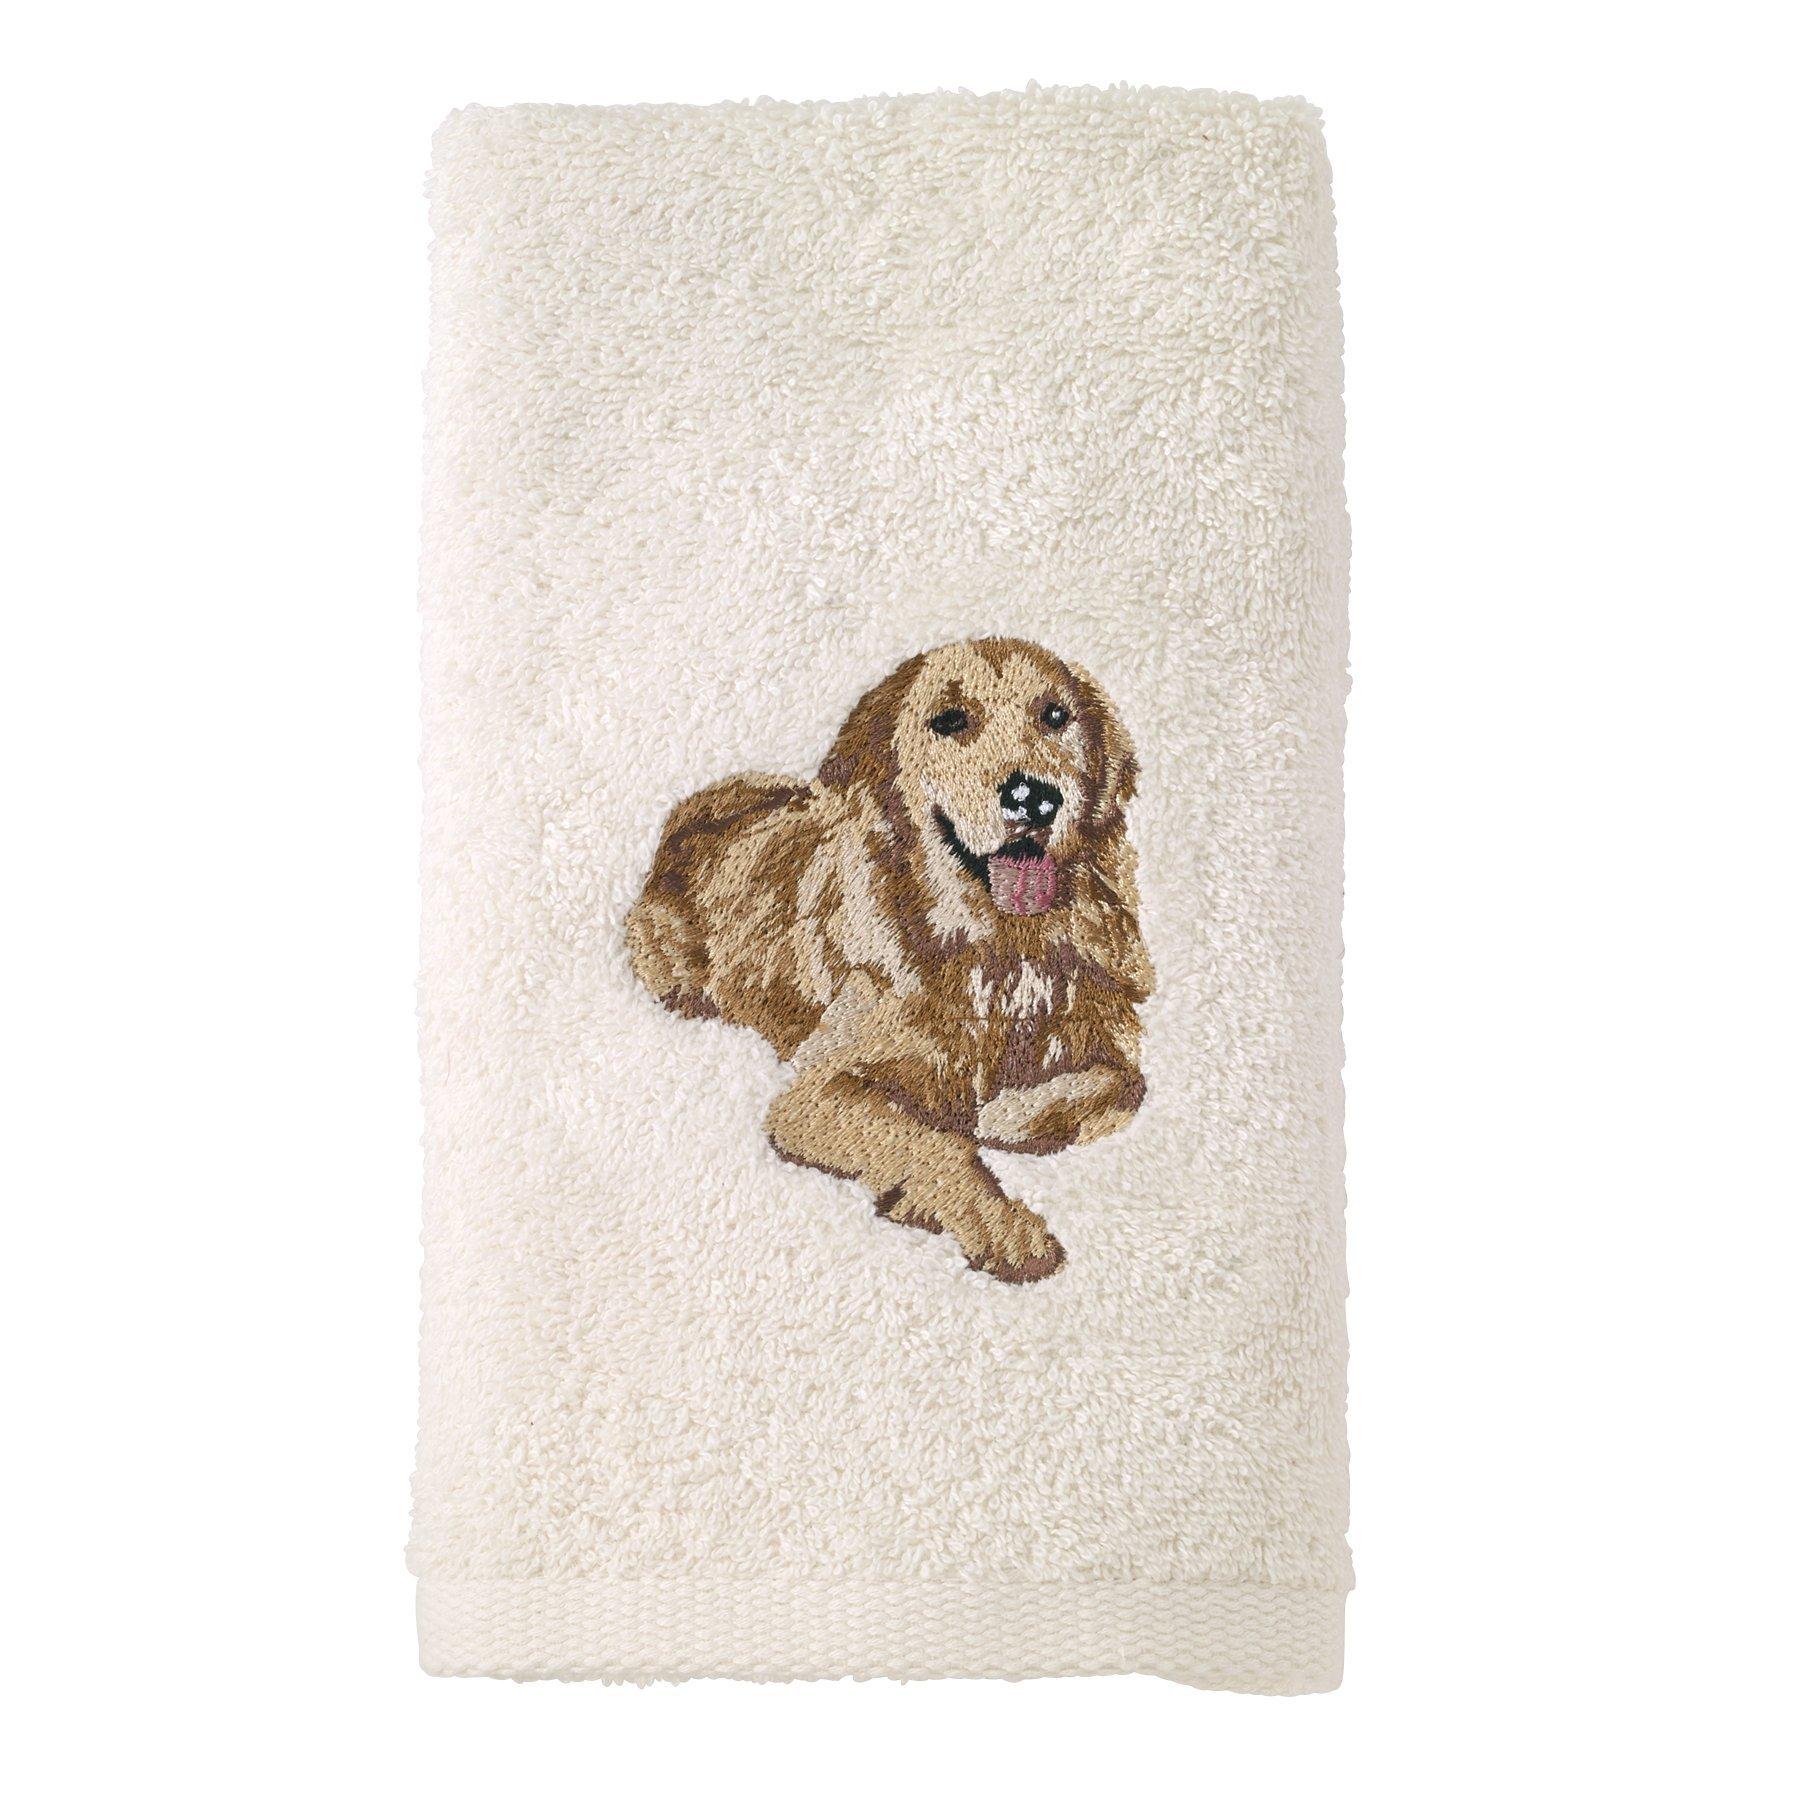 Avanti Linens 021552 GDN Golden Retriever Hand Towel 2 Pack, Ivory, 2 Piece